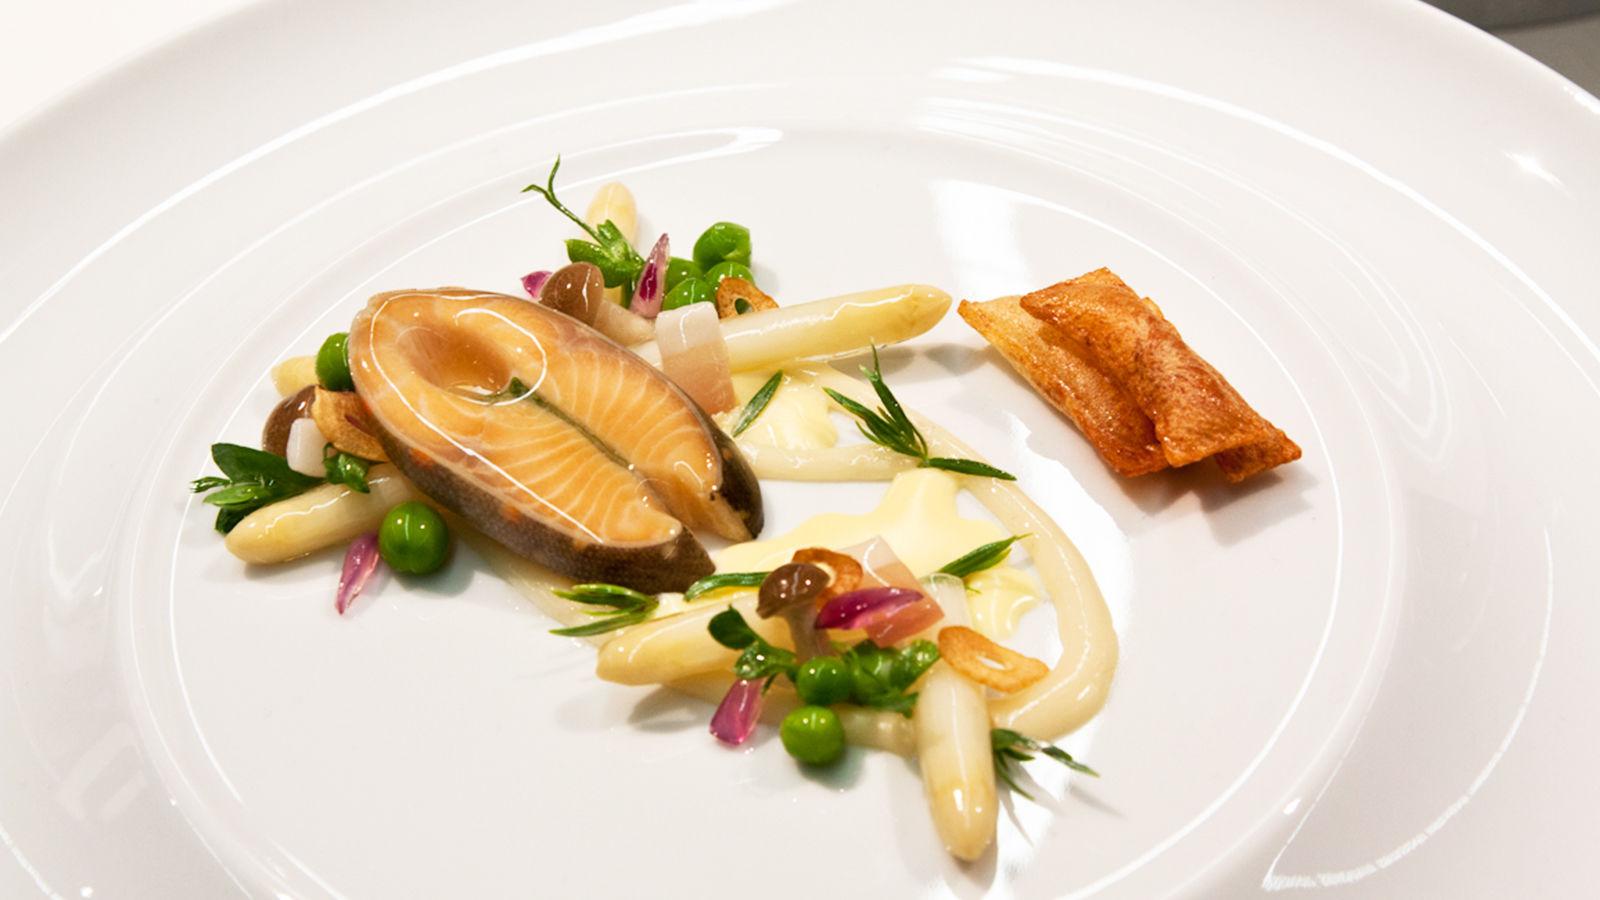 Gold Medal - 2012 Culinary World Olympics - Culinary Team Canada - Chef Brad Horen